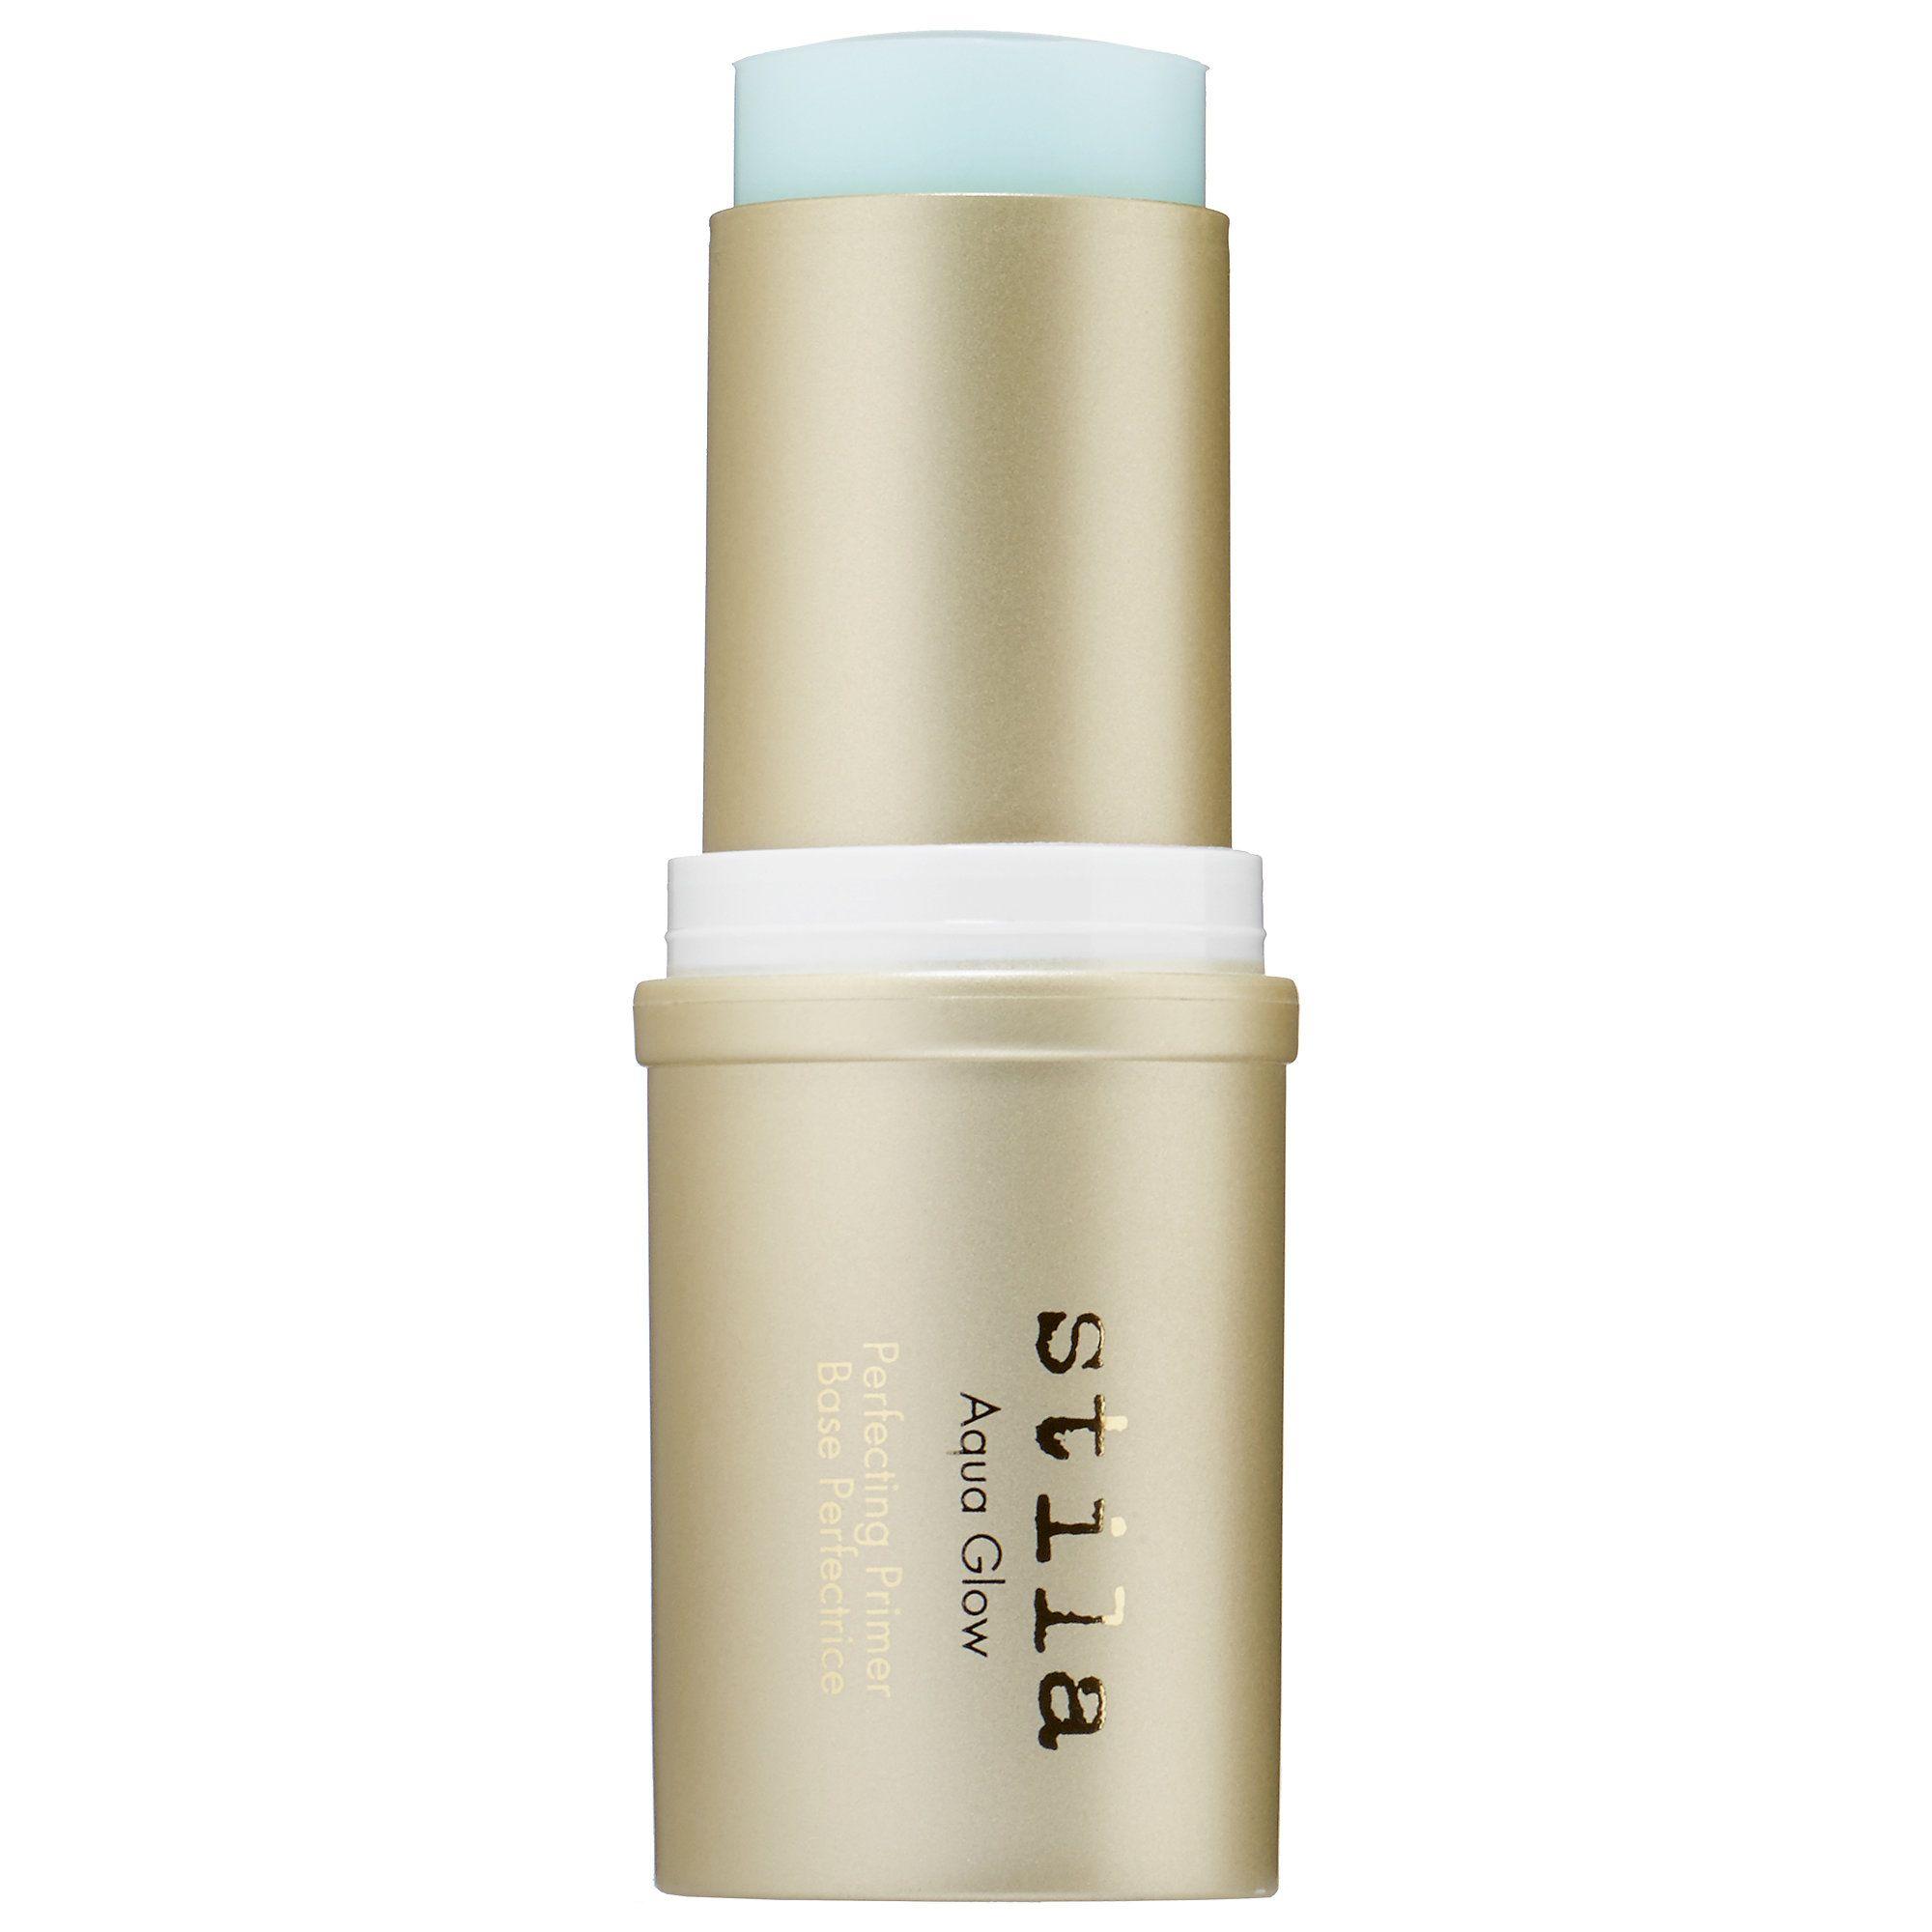 Aqua Glow Perfecting Primer Stila Sephora Glow Primer